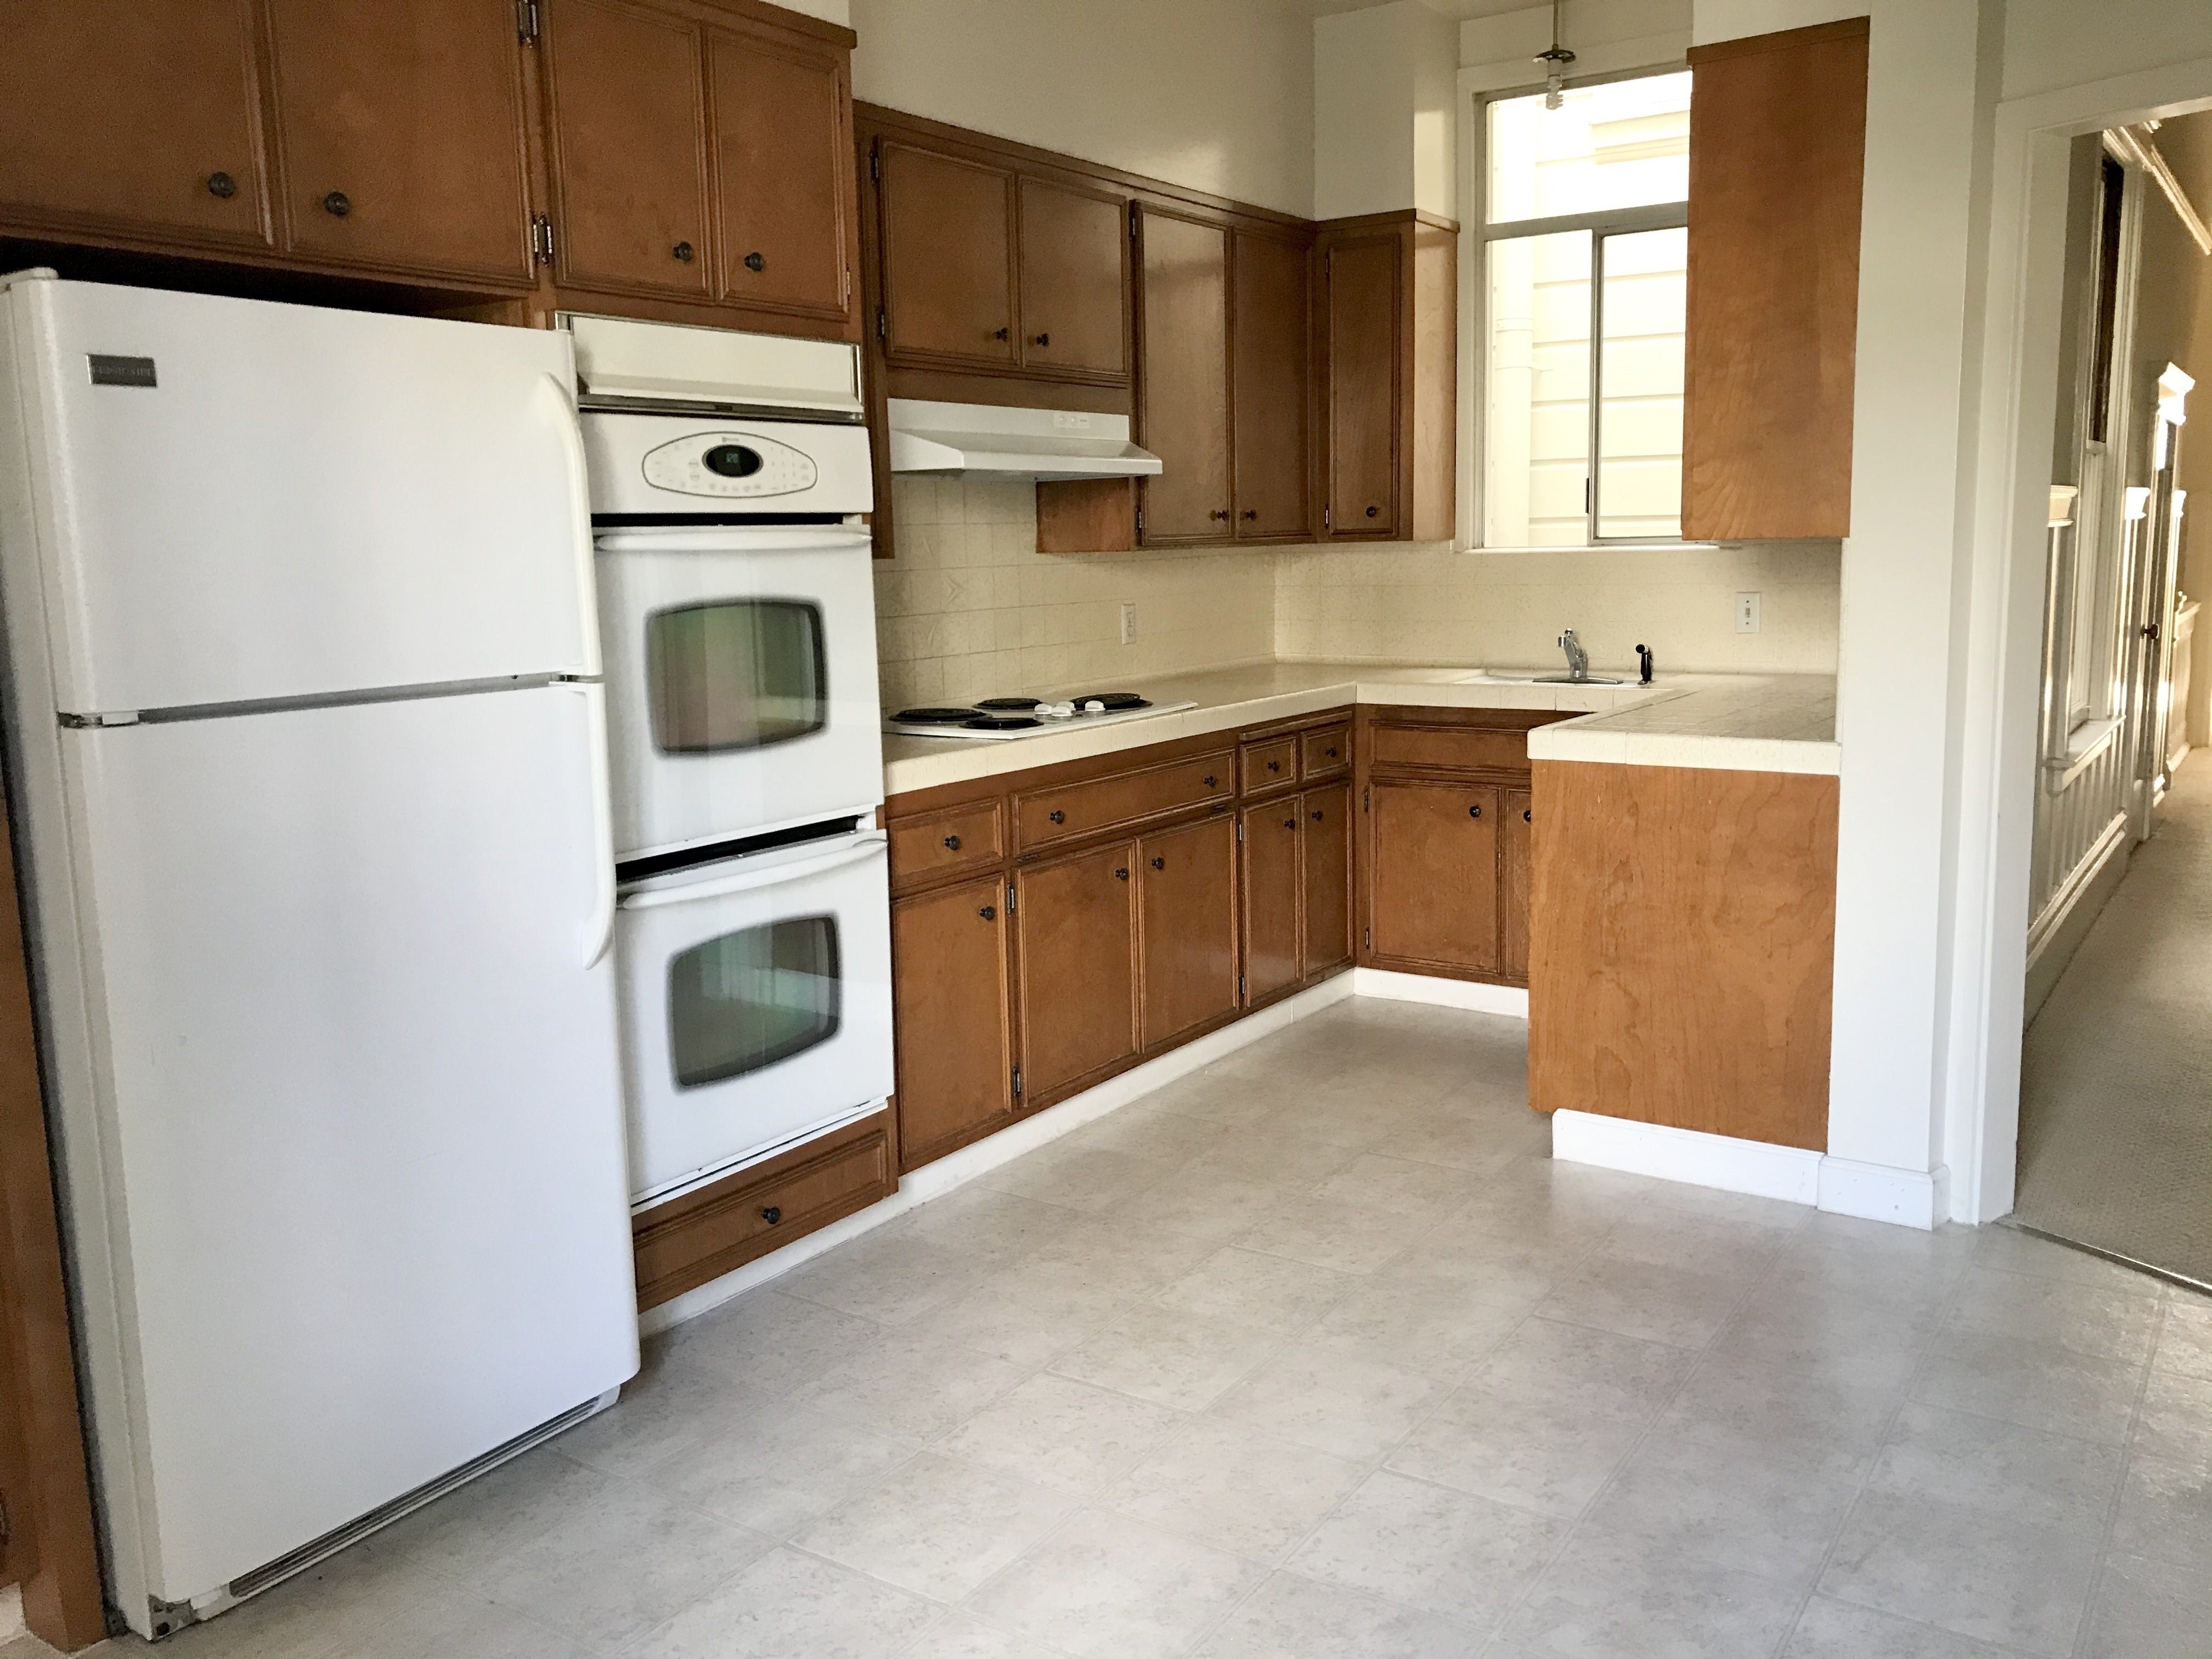 534 Lombard Street, San Francisco, CA, 94133 - 15